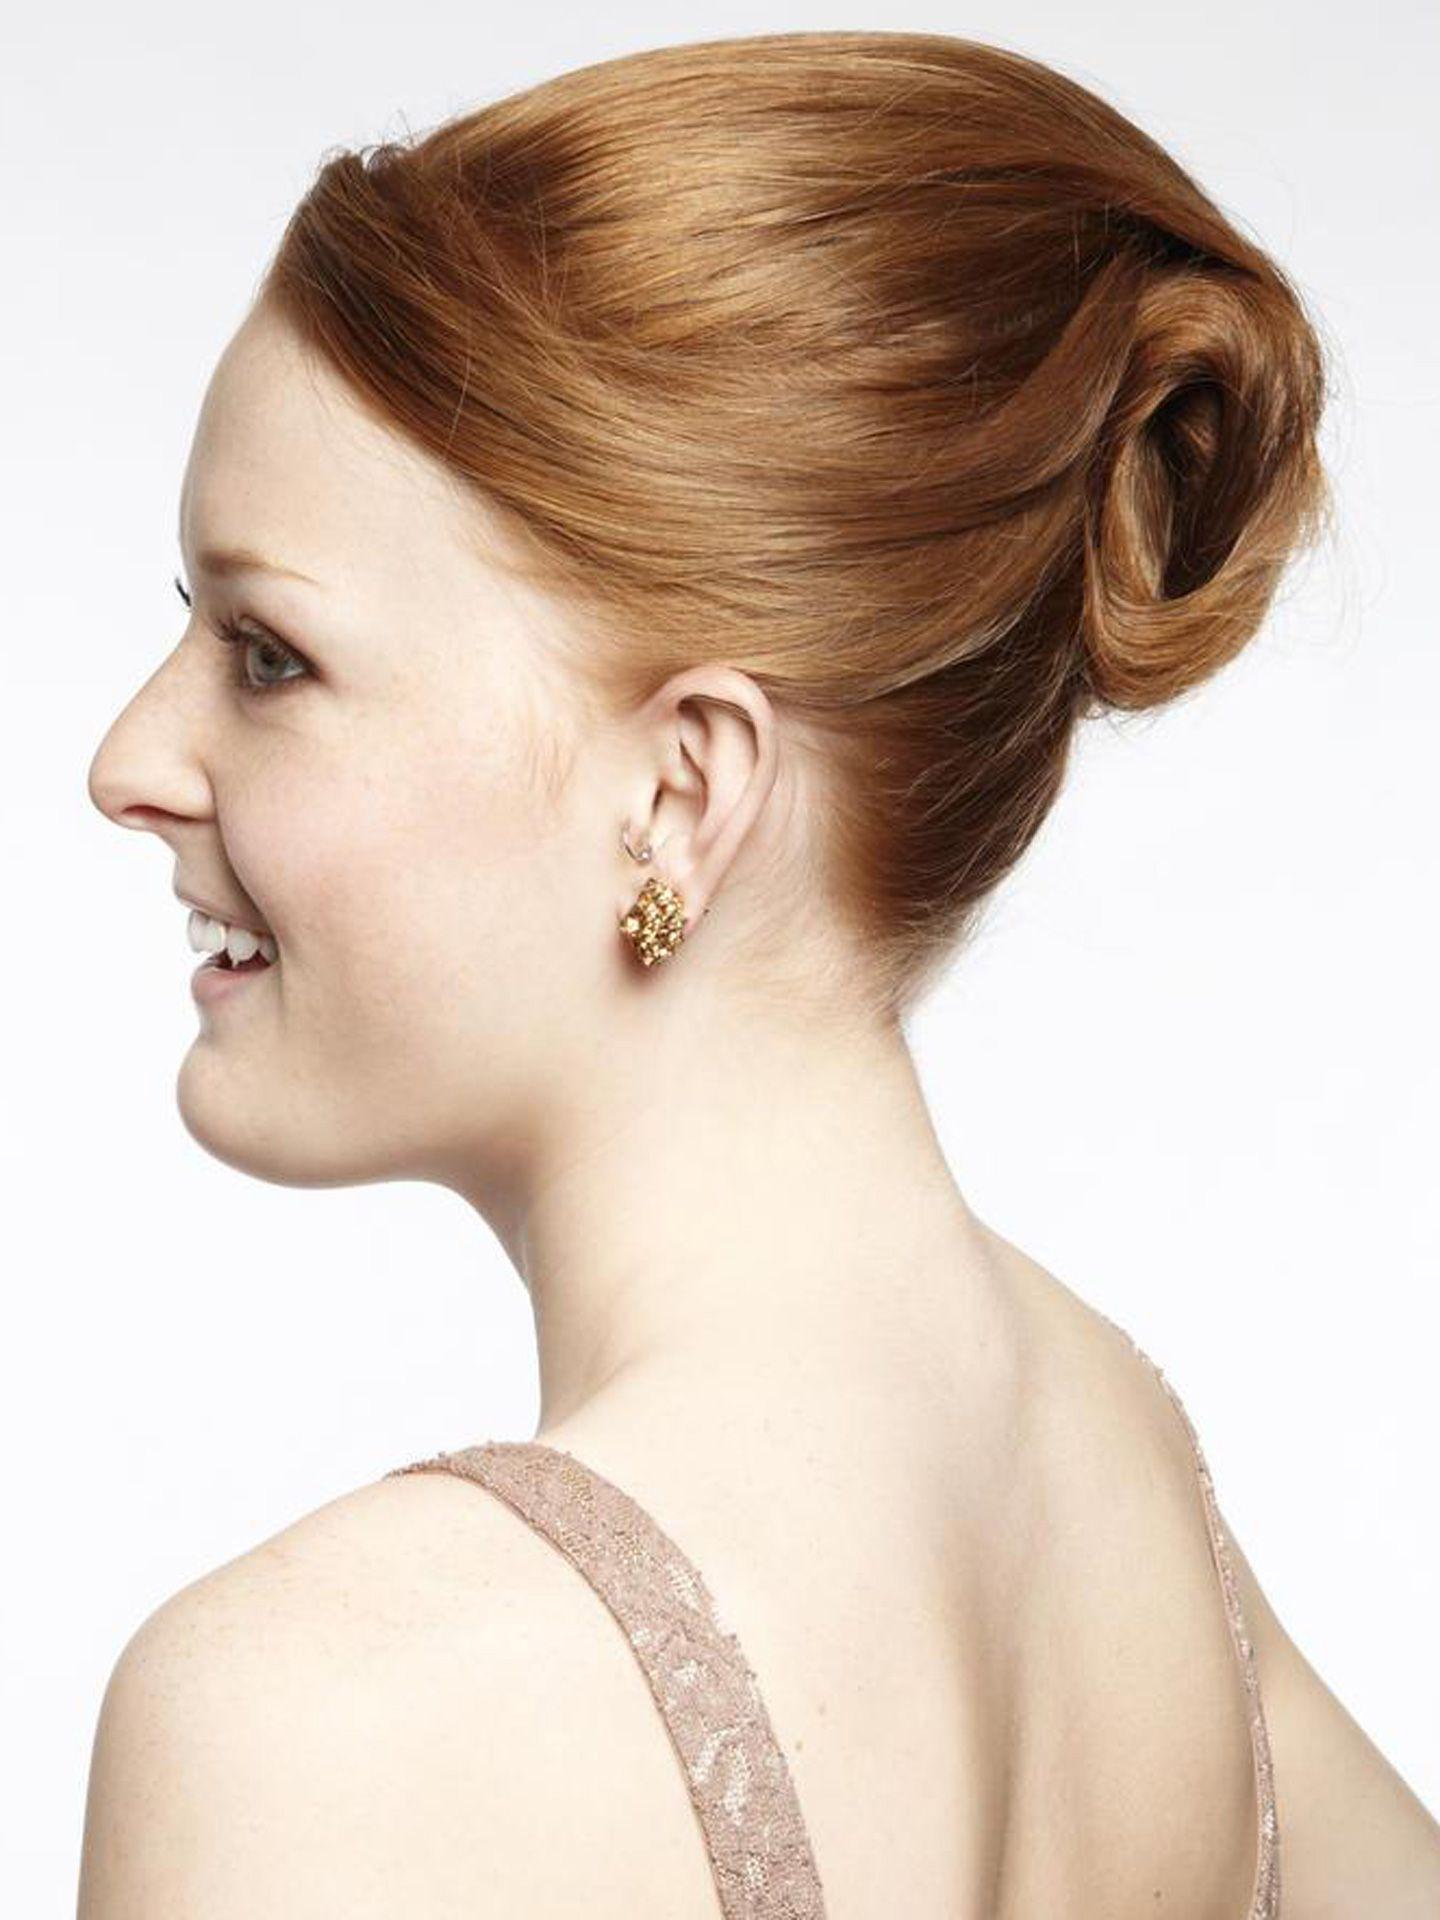 11 Chignon Hairstyles We Love Chignon Hair Tutorials